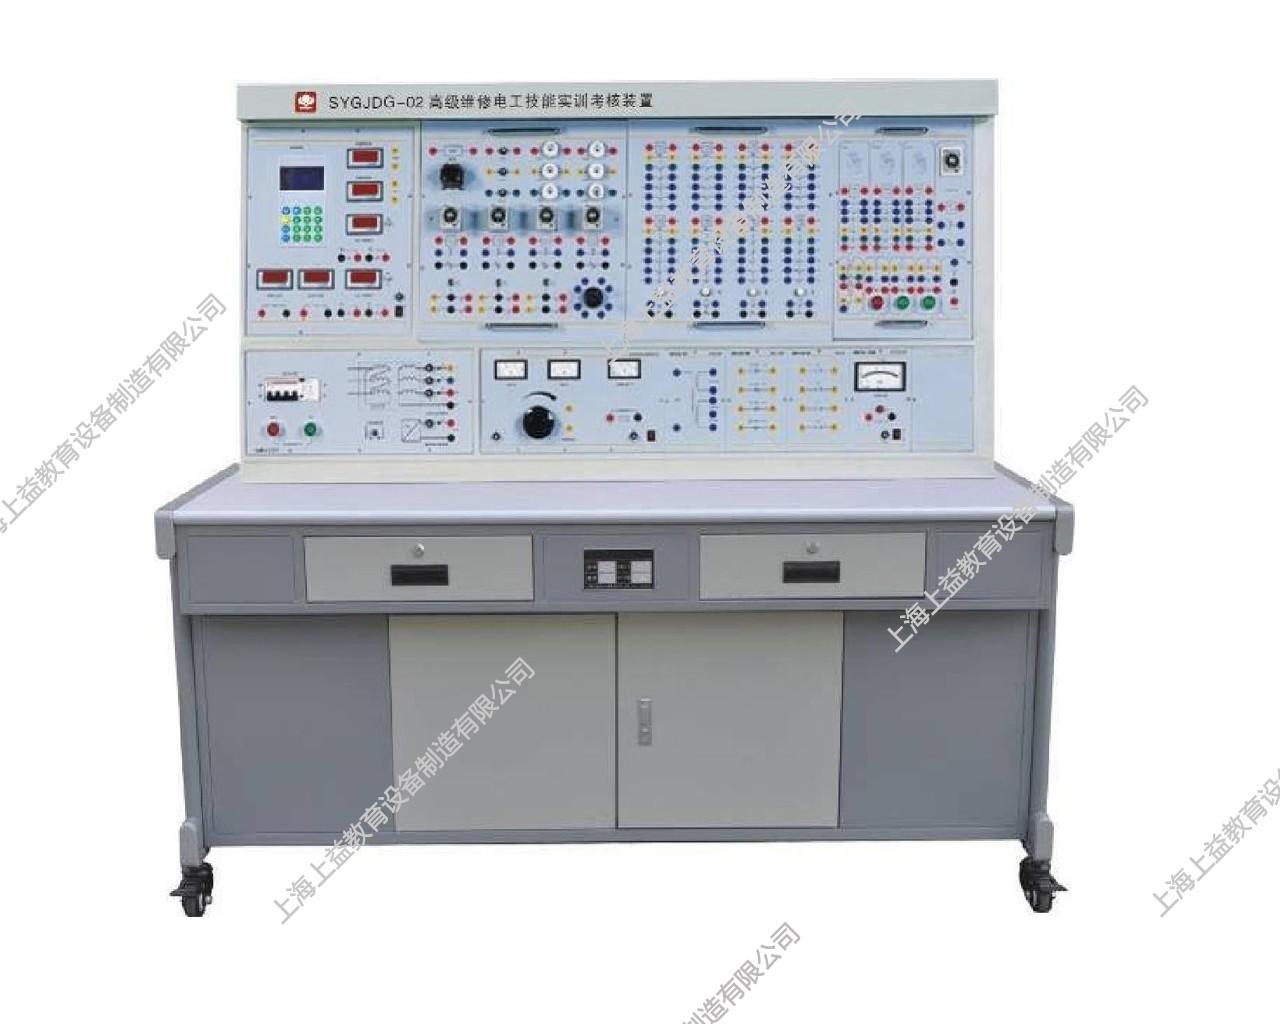 SYGJDG-02高级维修电工技能wwwlehu8viplehu68vip装置